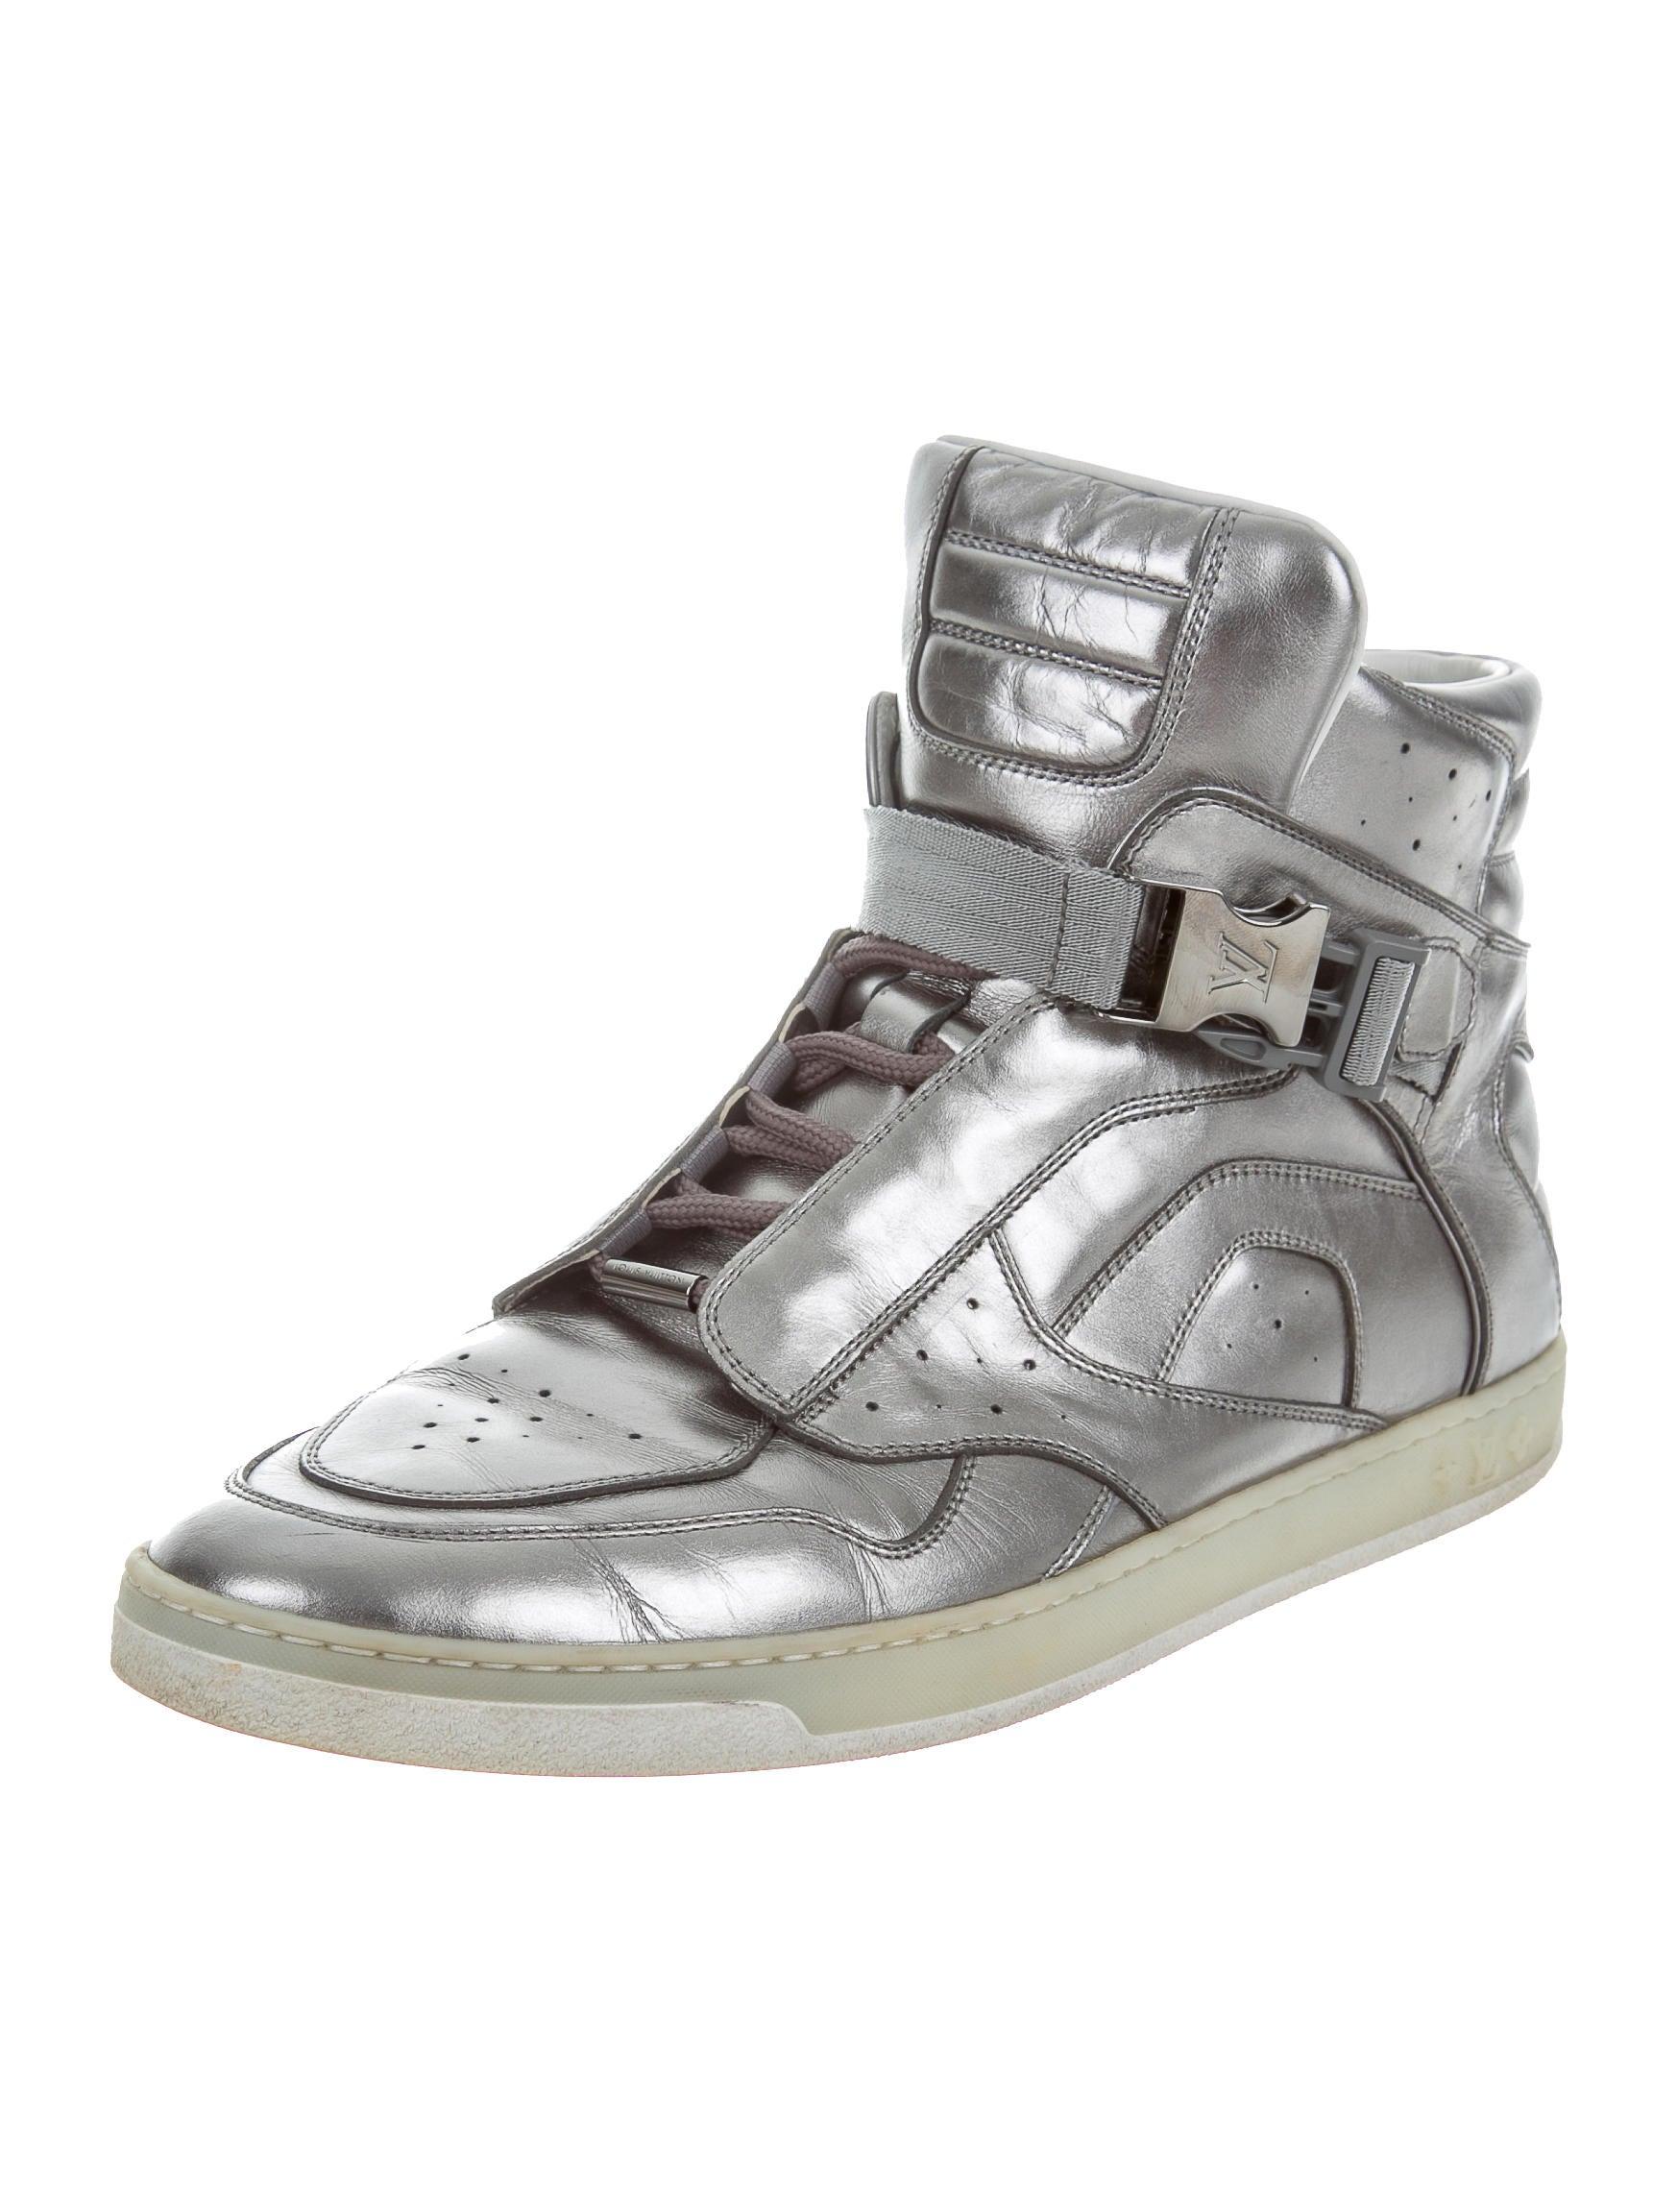 Louis vuitton sneakers for women high top